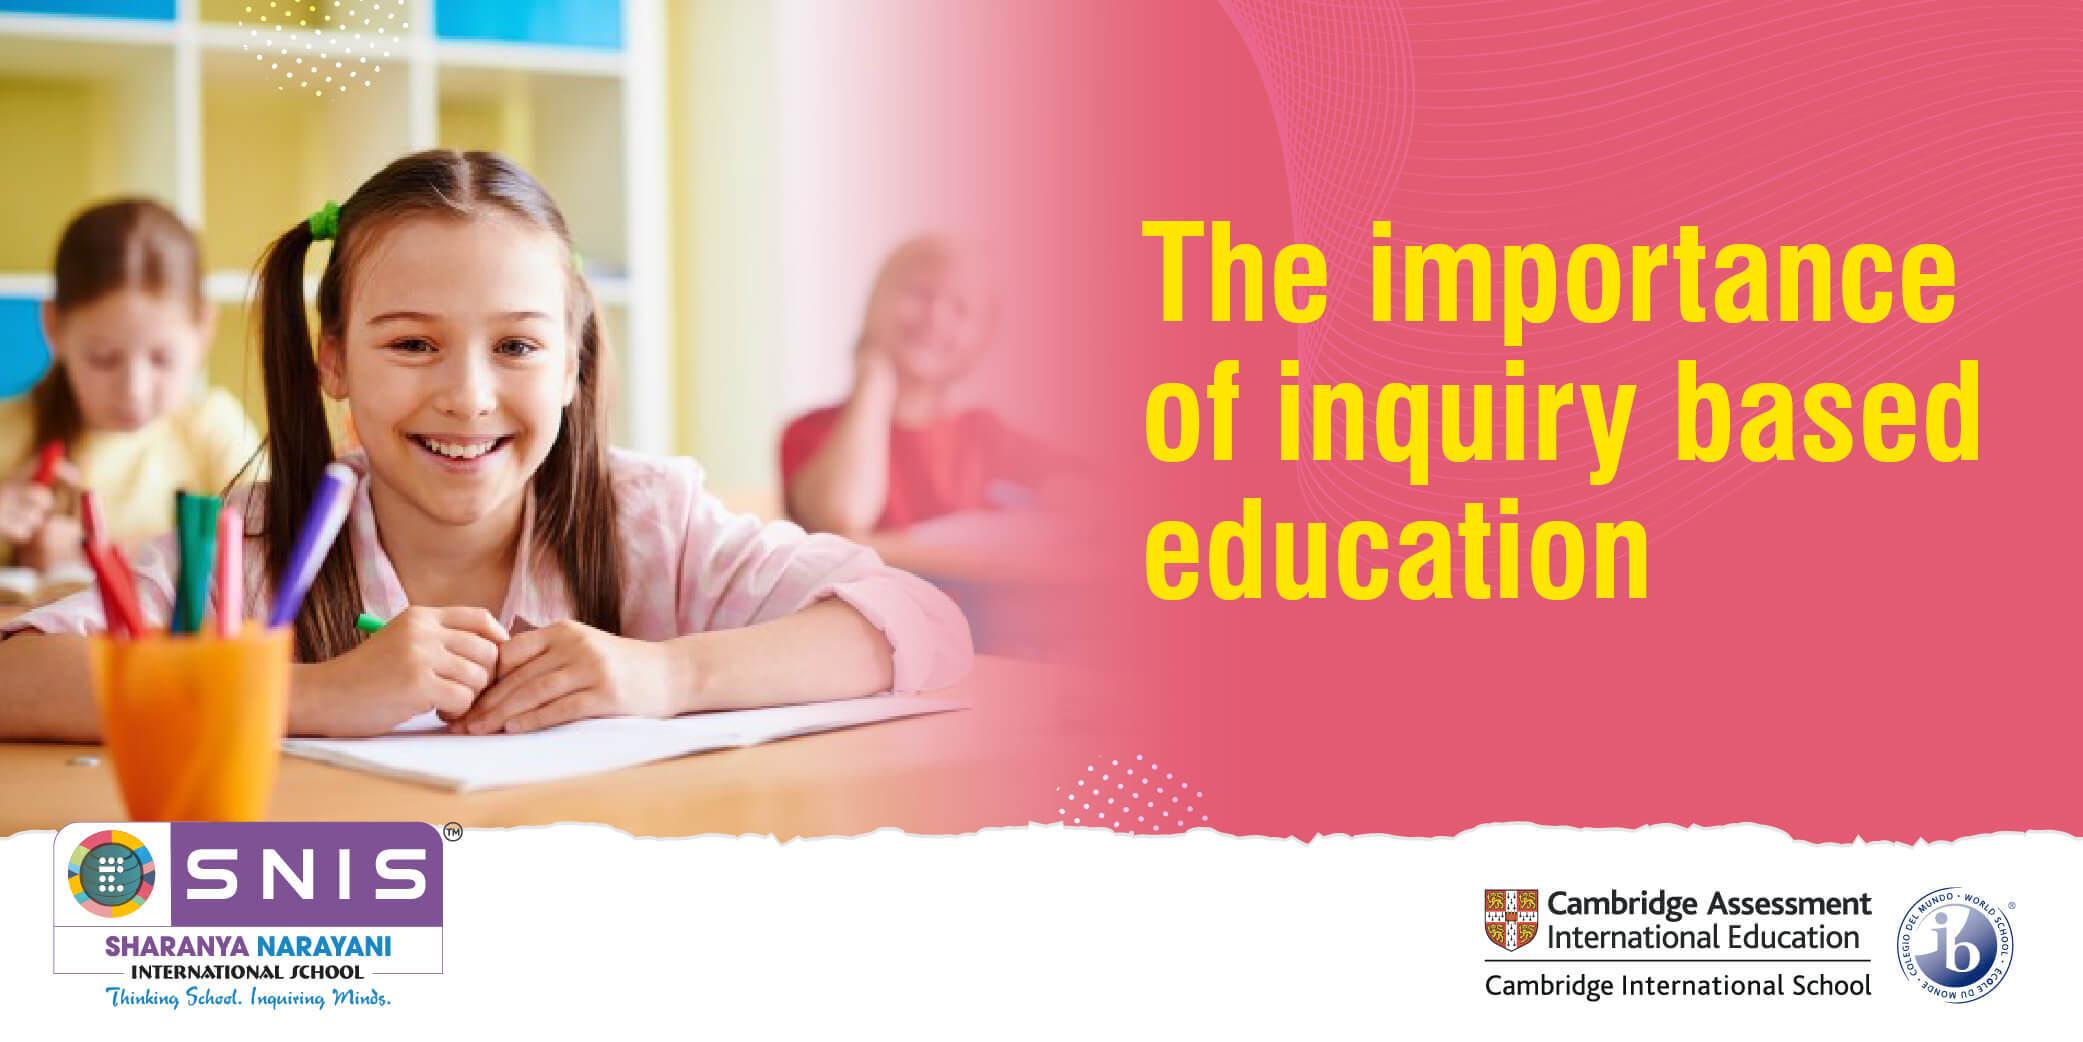 inquiry based education by international boarding school